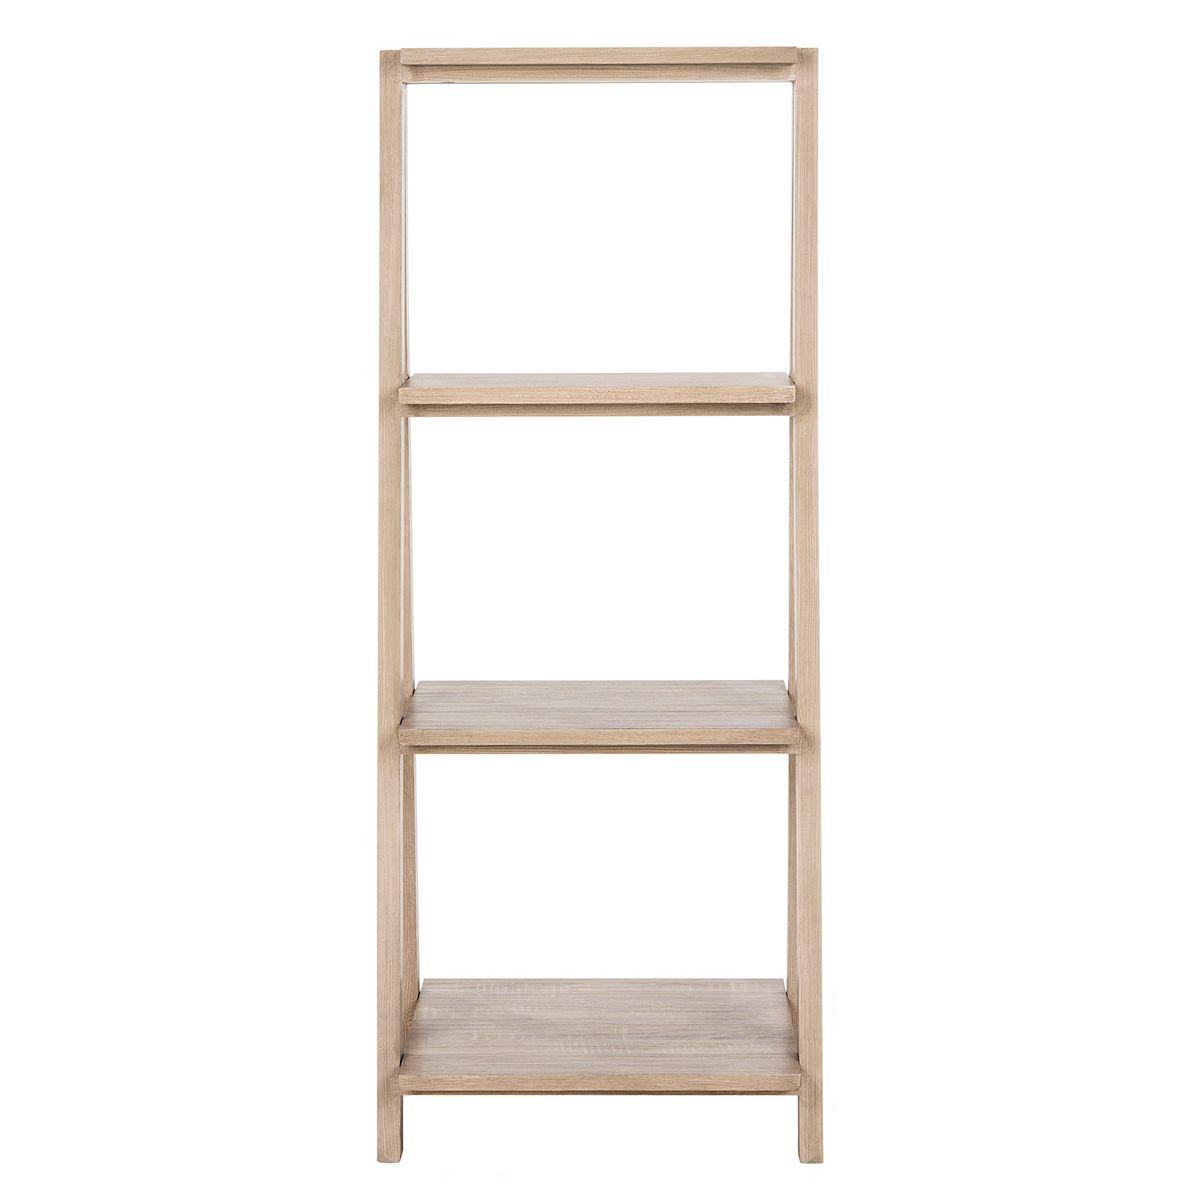 Safavieh Rustic Ladder 3-Tier Bookshelf eu8XA